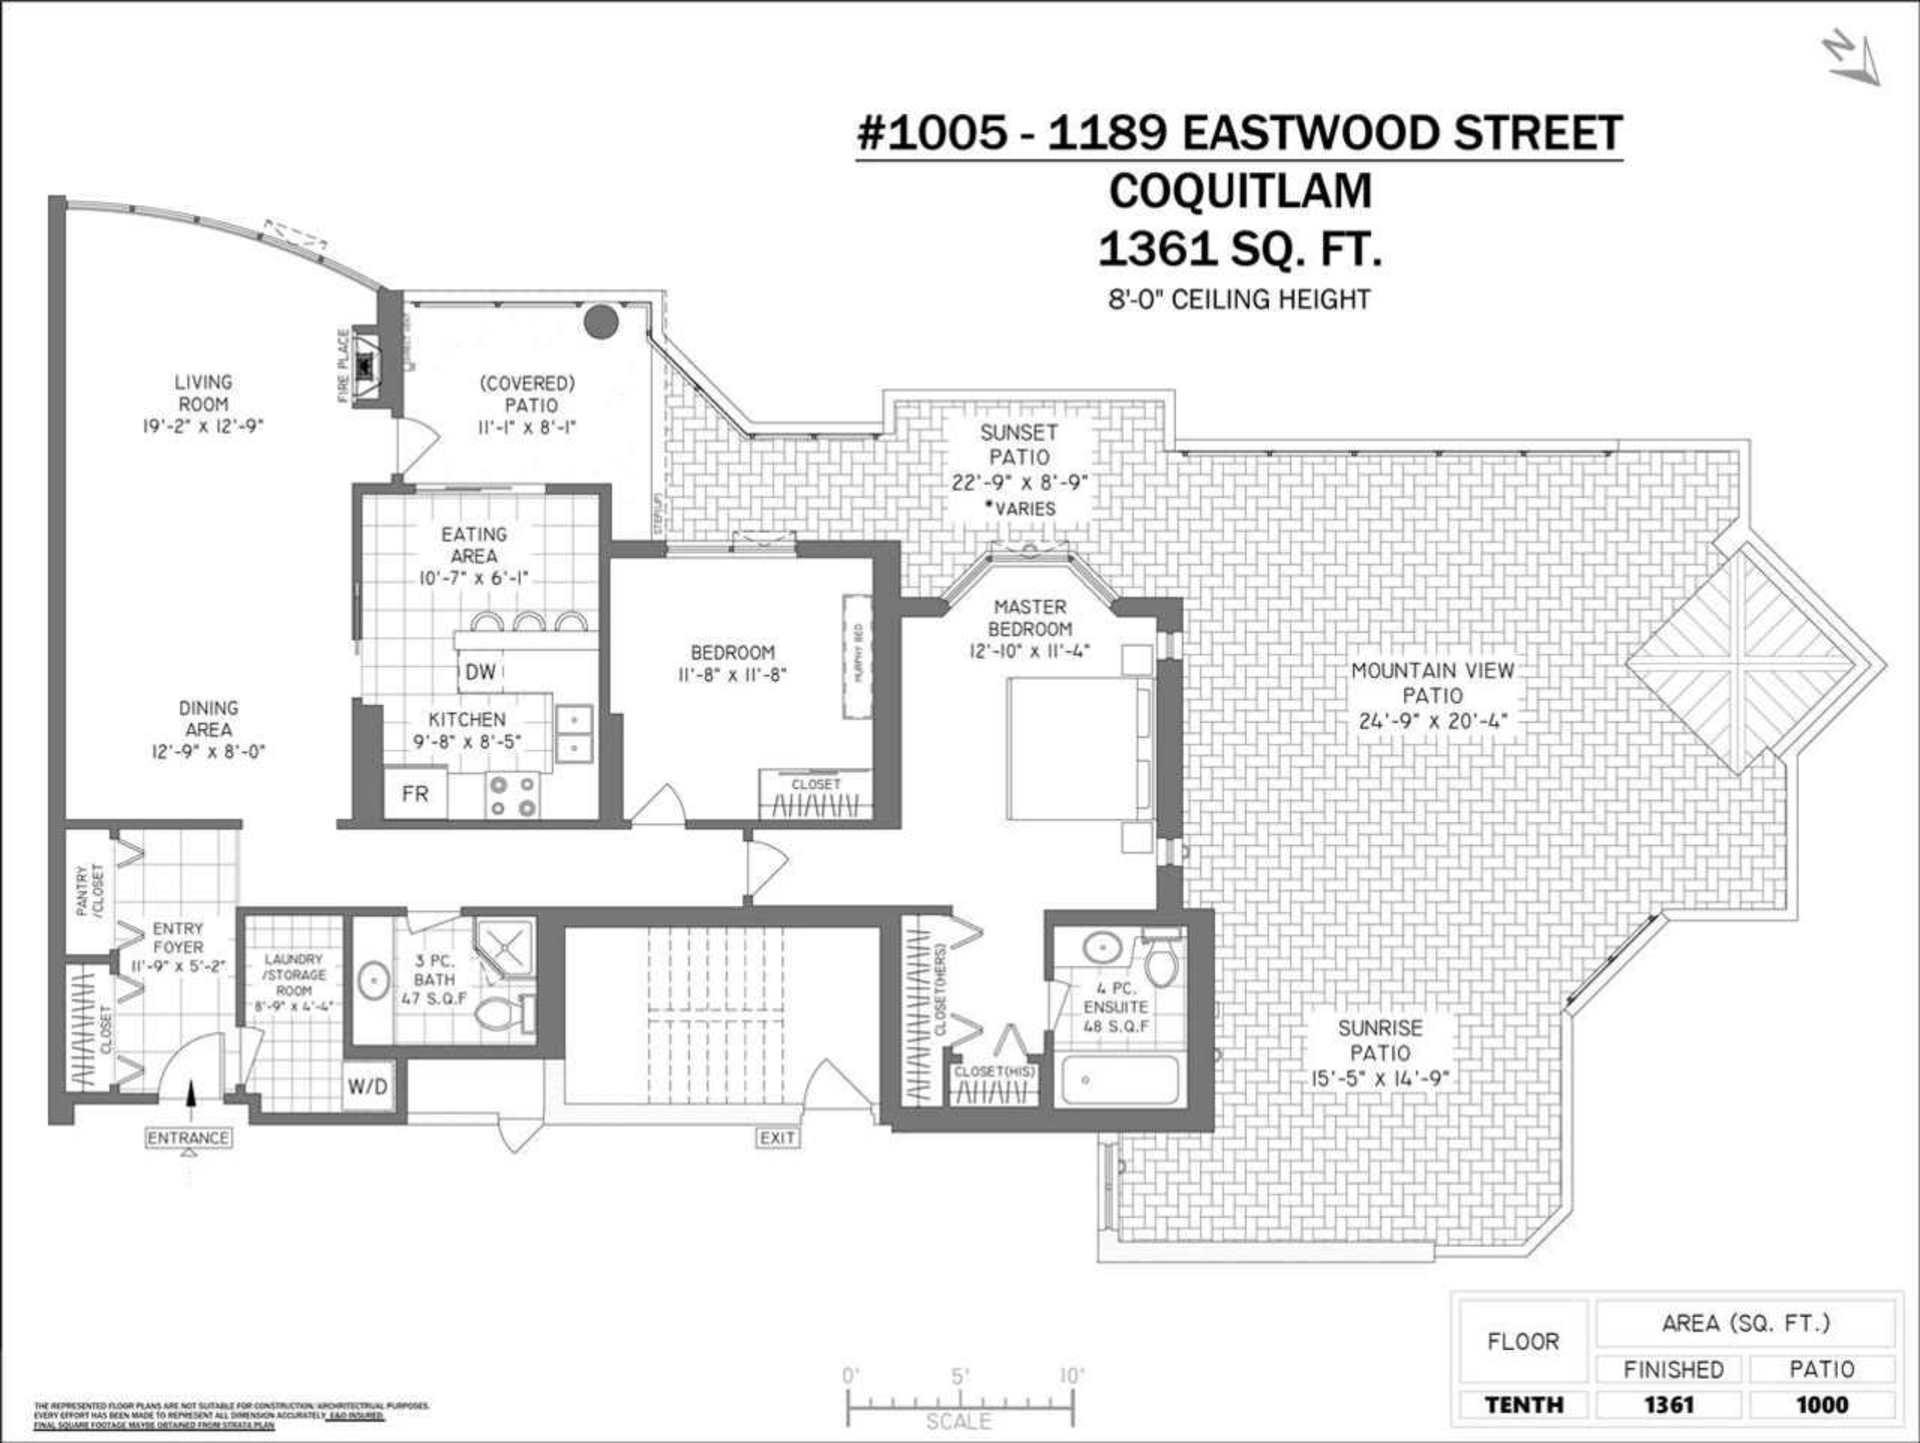 1189-eastwood-street-north-coquitlam-coquitlam-20 at 1005 - 1189 Eastwood Street, North Coquitlam, Coquitlam